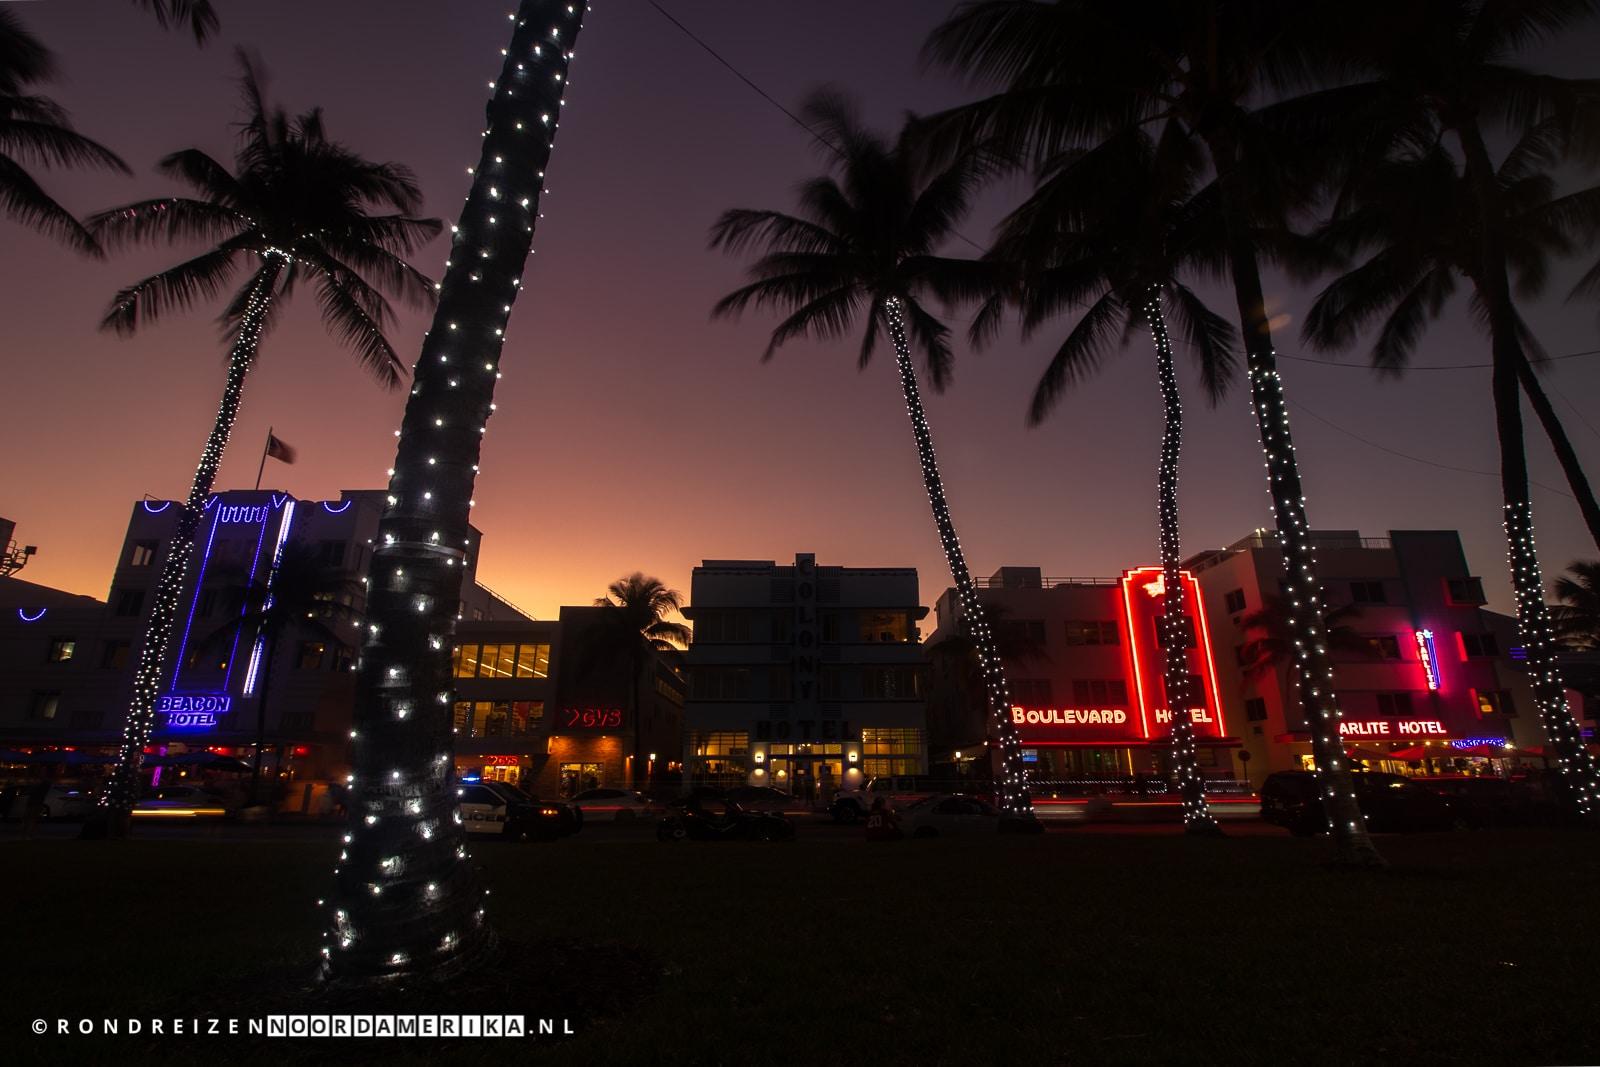 Colony Hotel verlichting uit